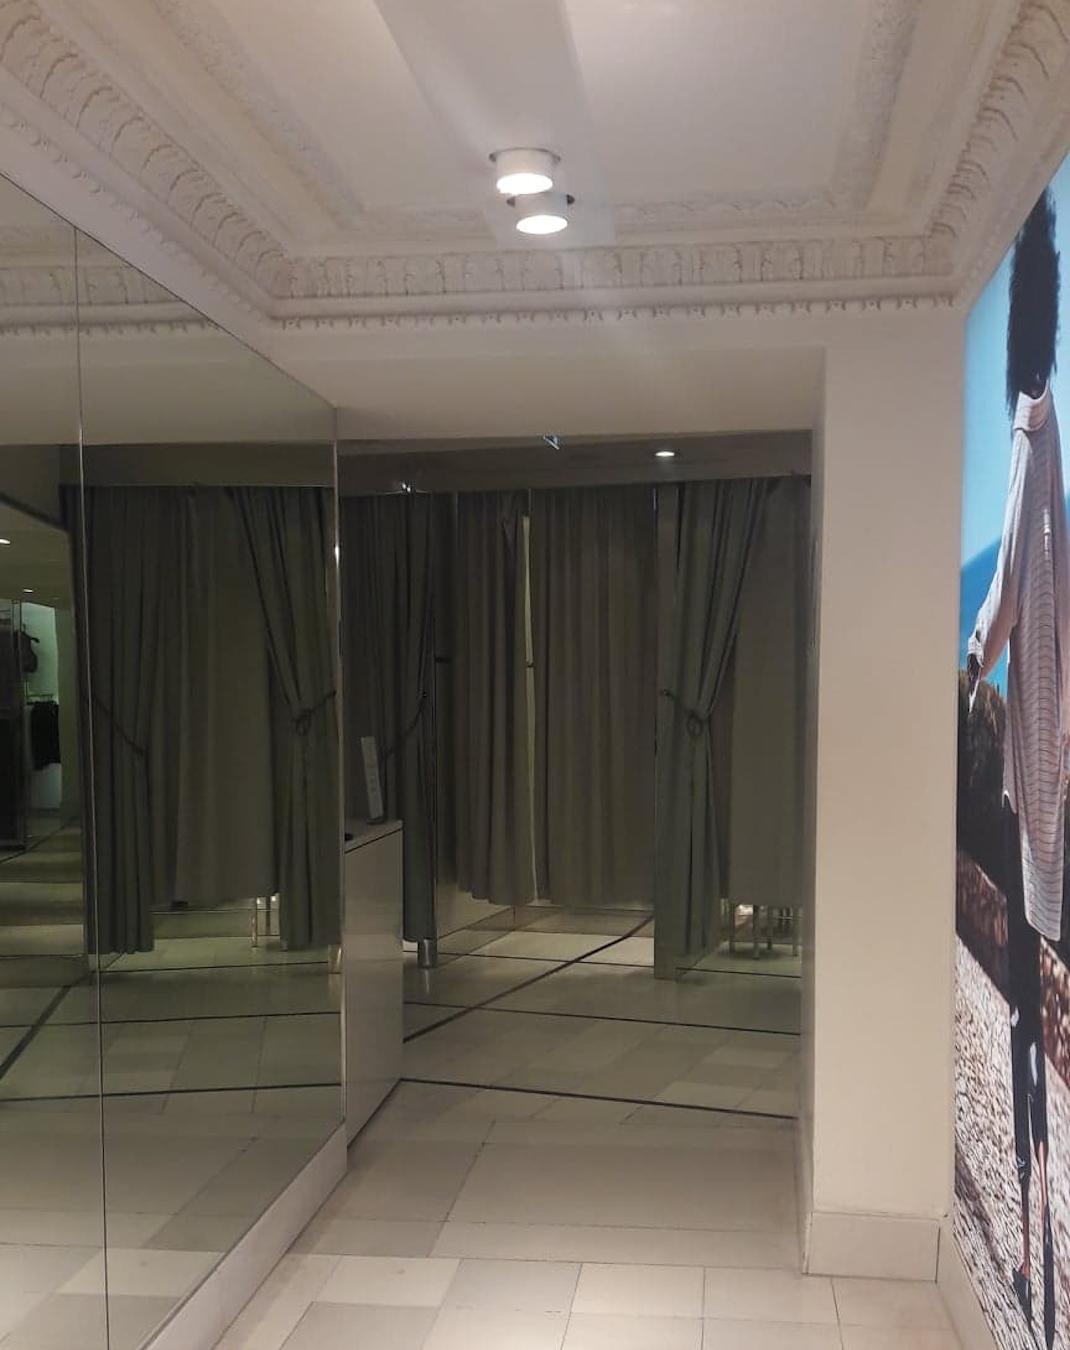 Zara ψώνια μετά την καραντίνα